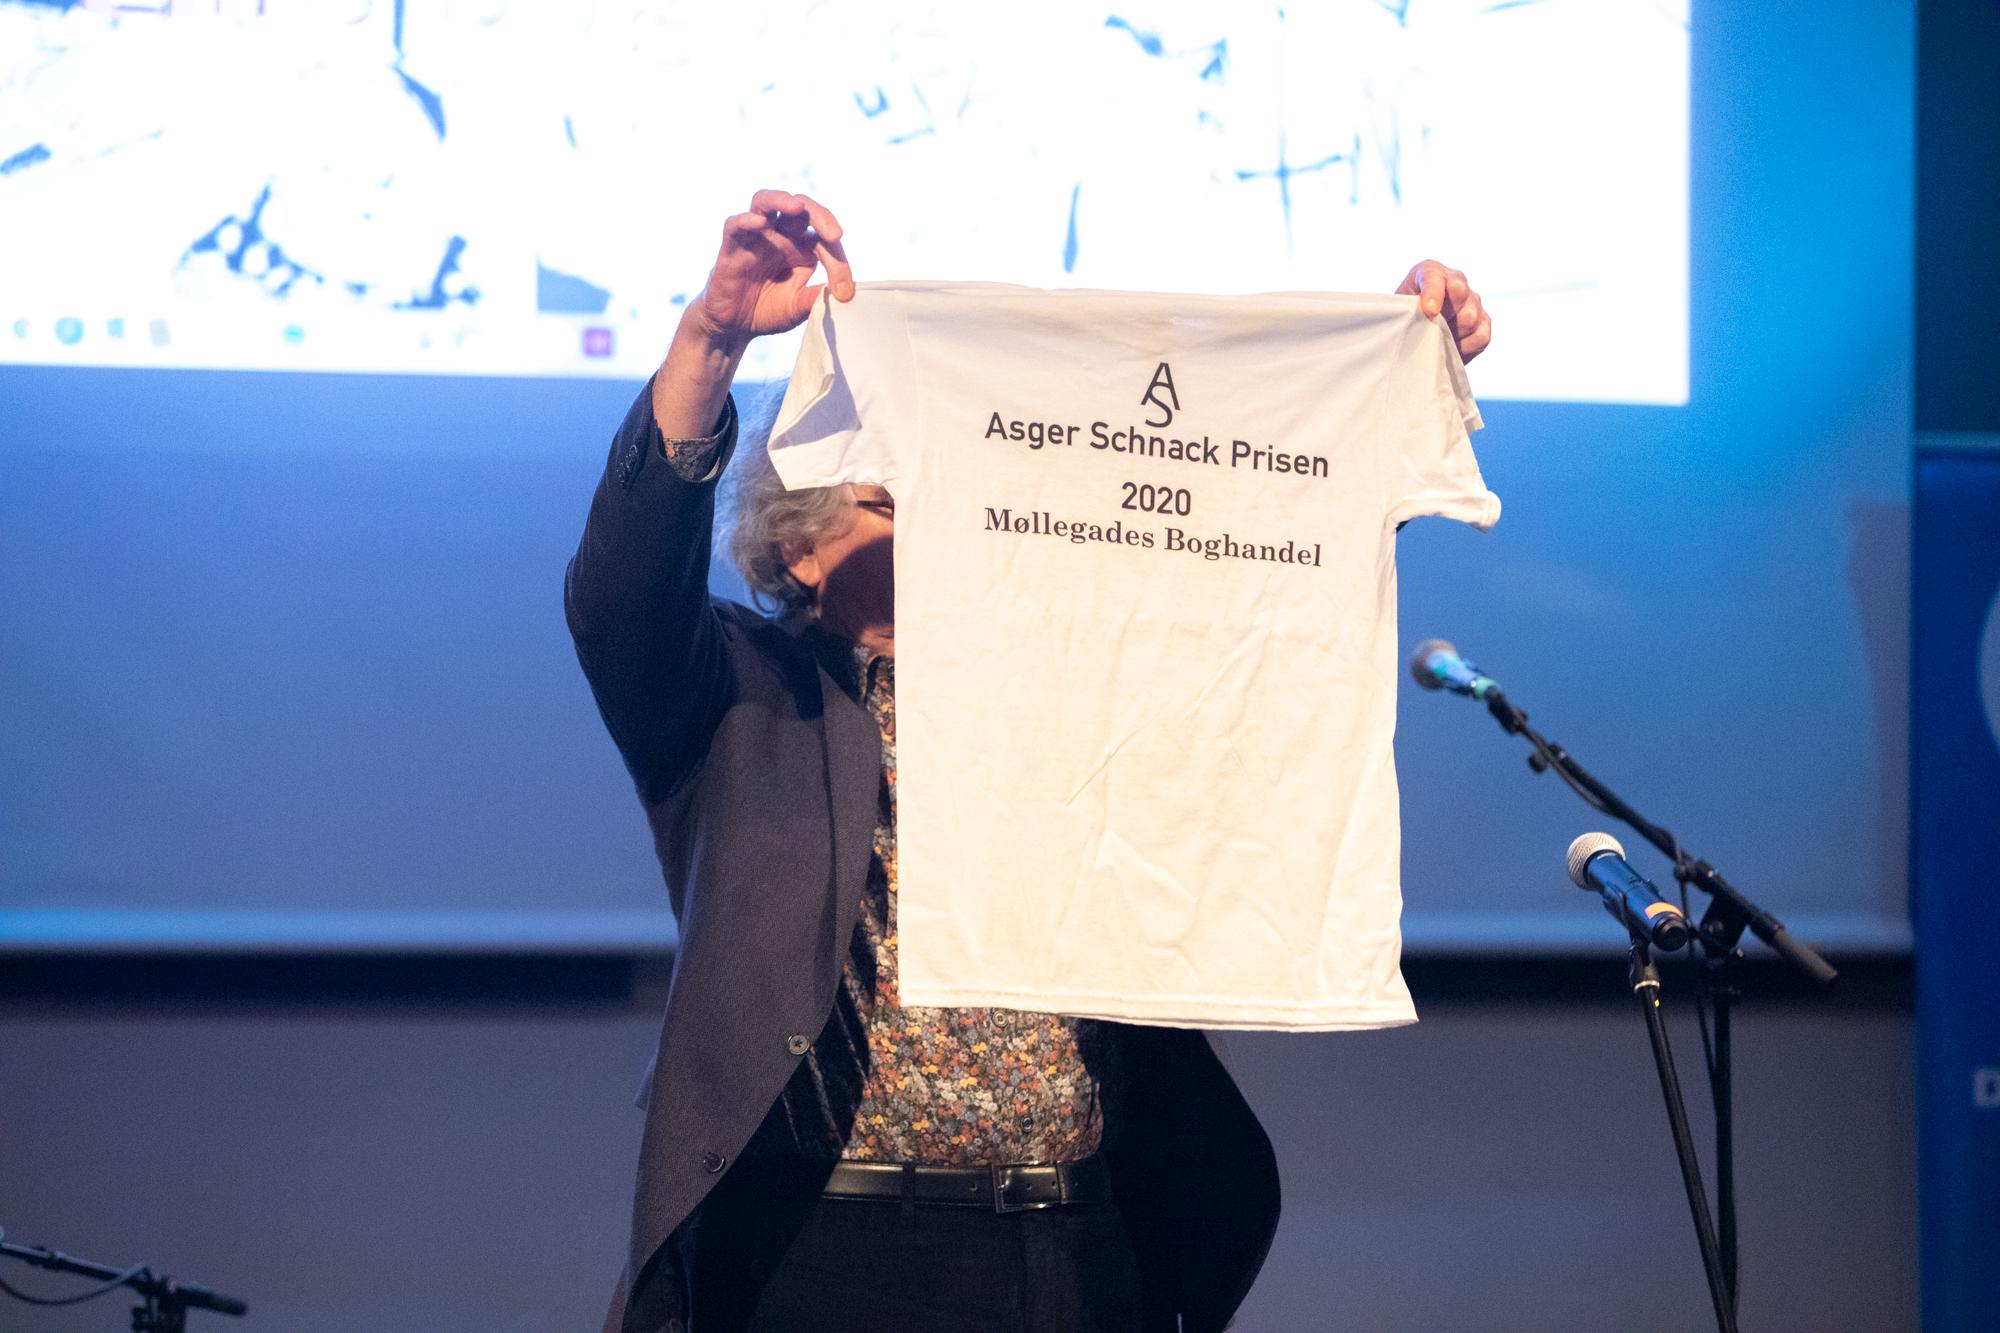 Asger Schnack prisen 2020